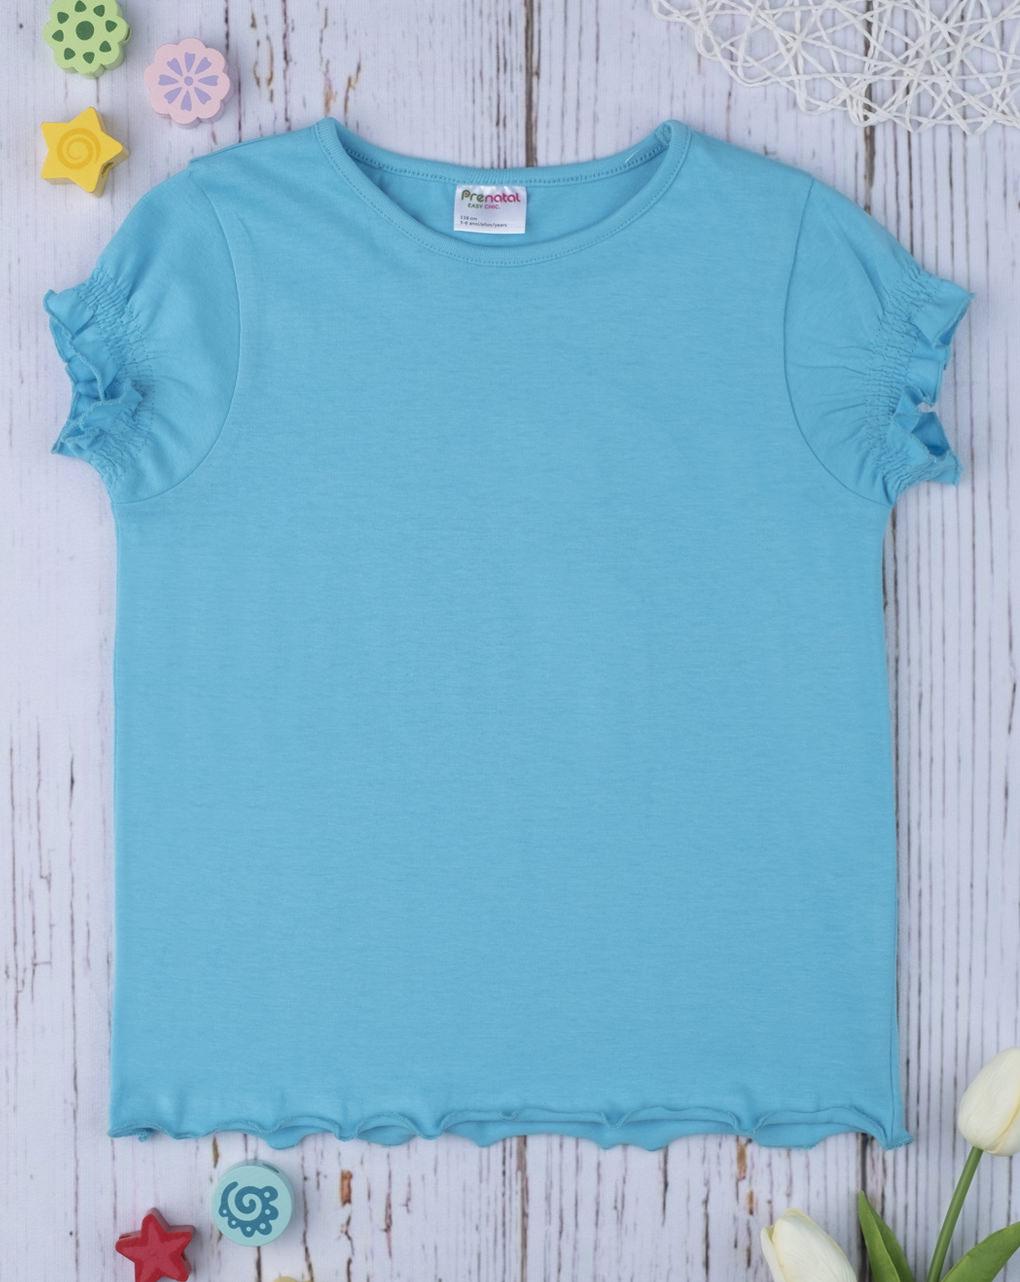 T-shirt girl total azzurro - Prénatal